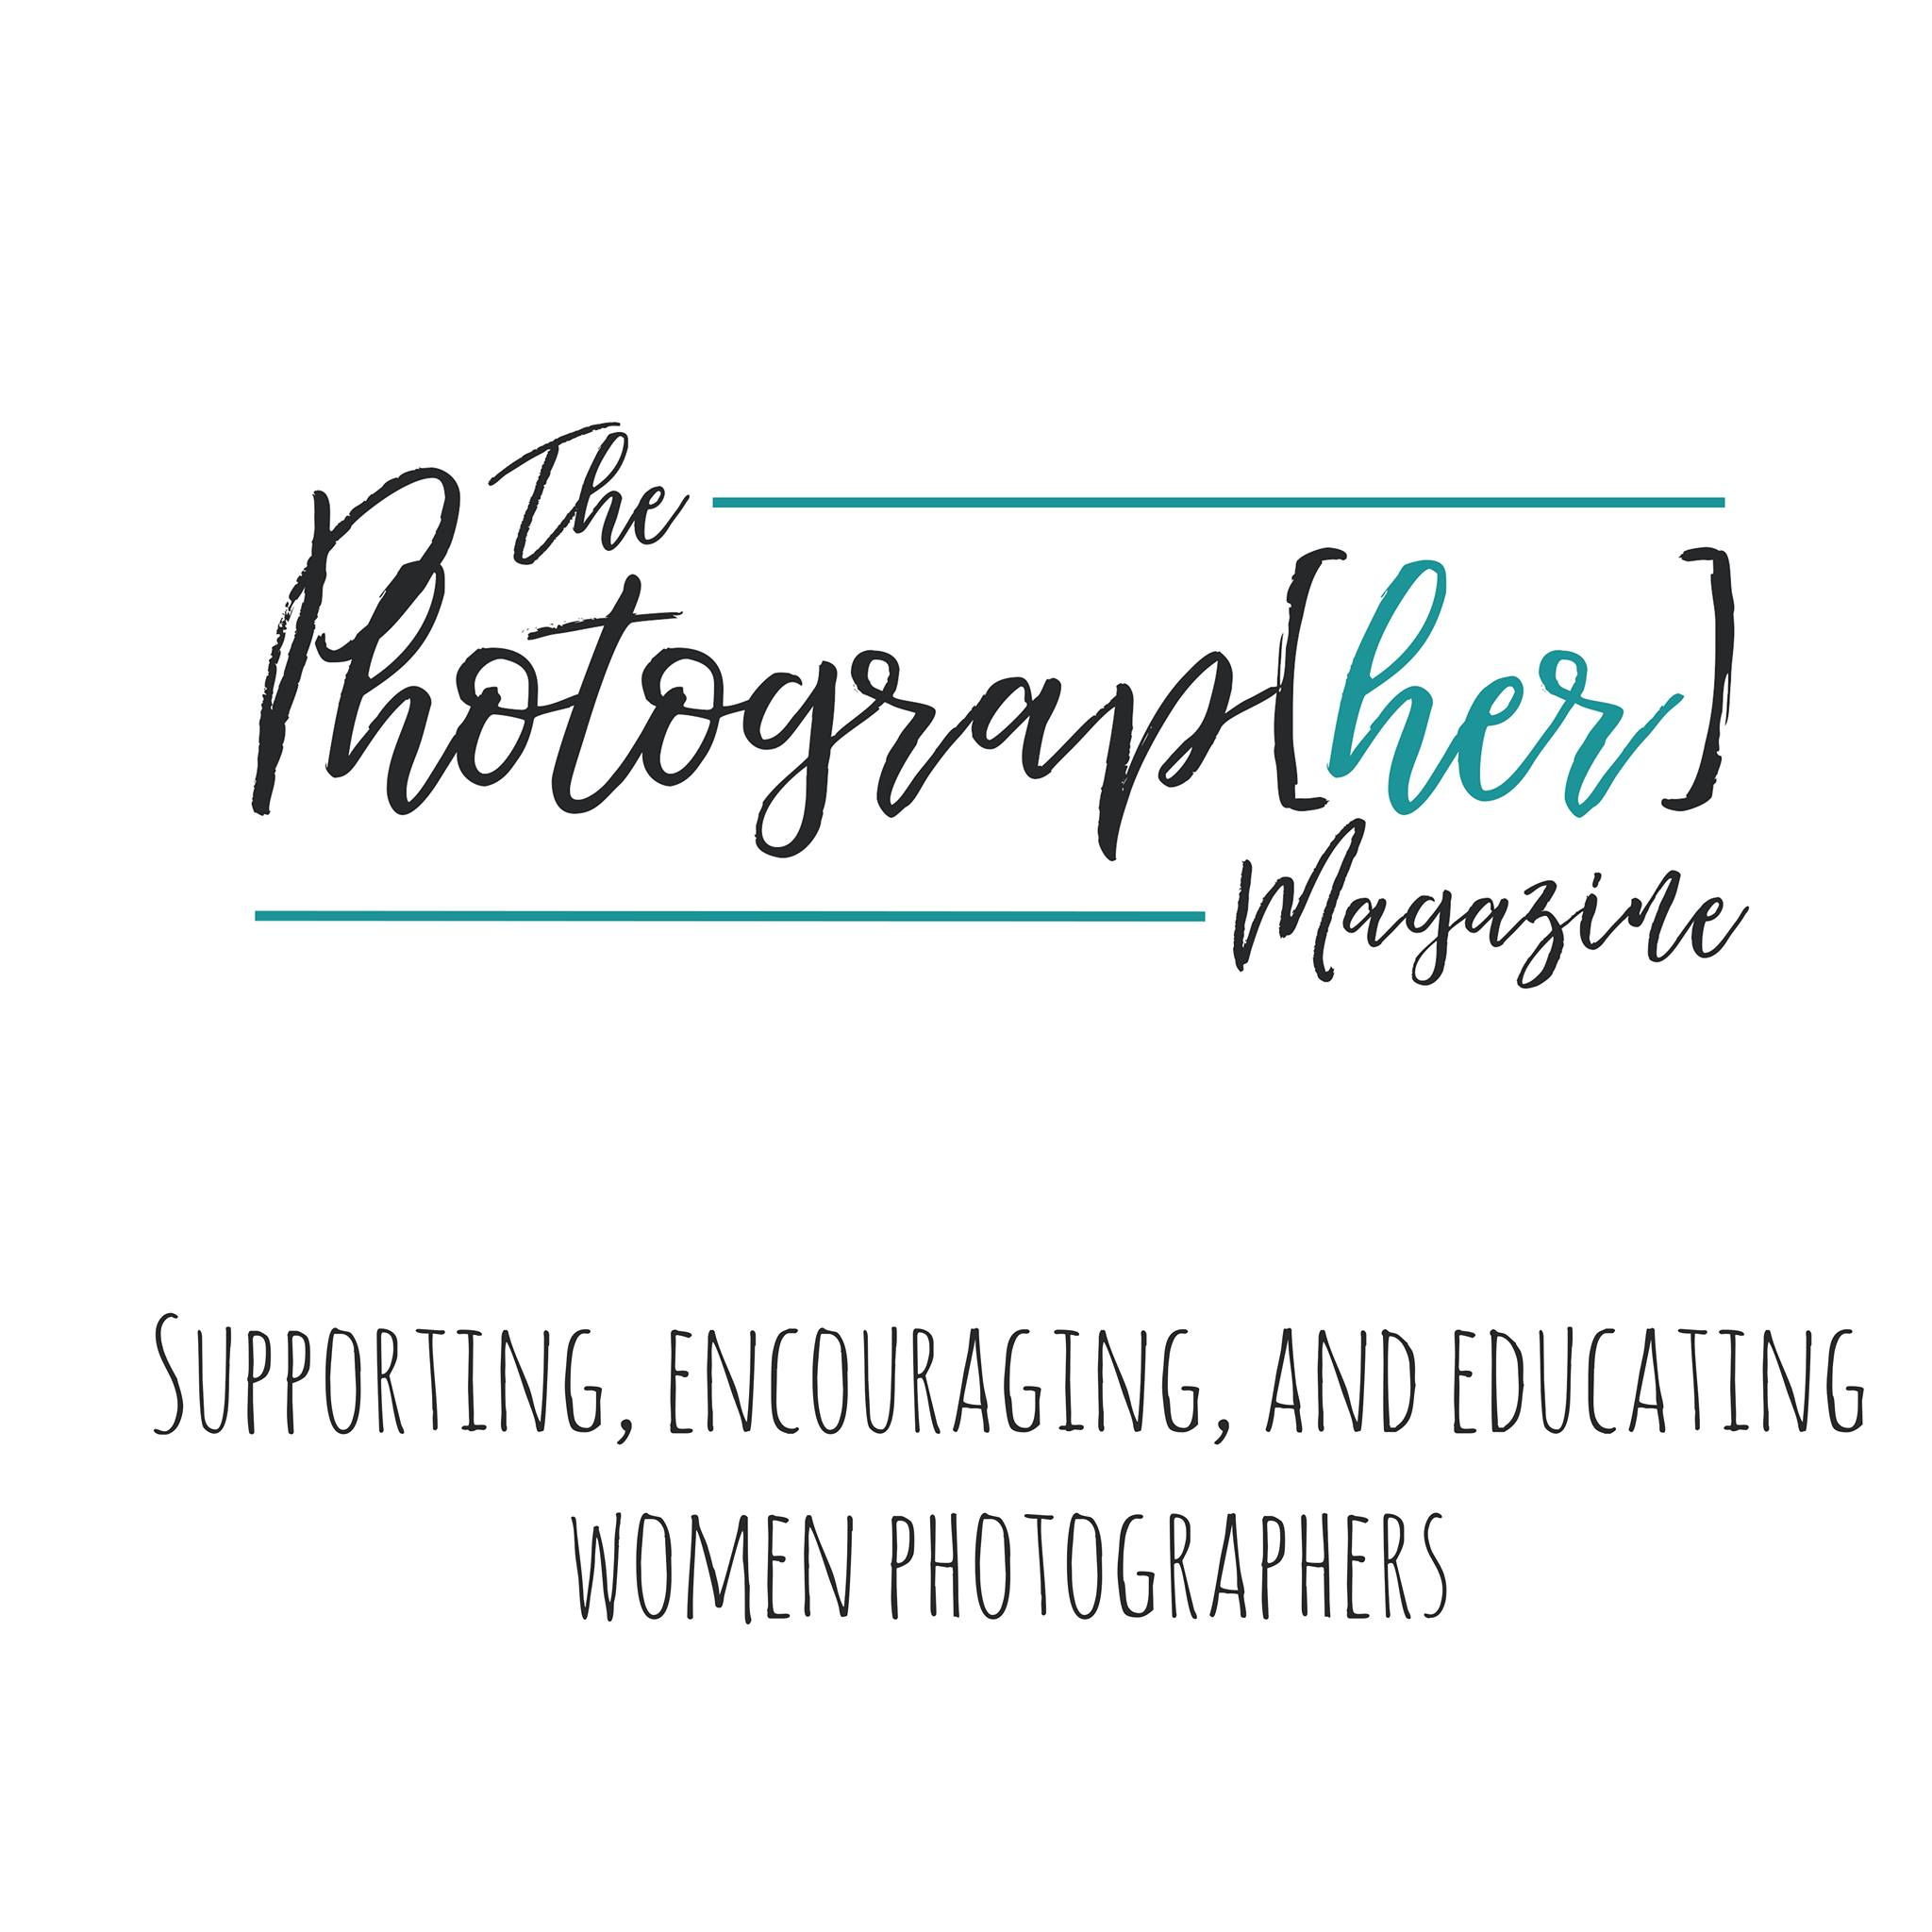 Logo The-Photograp.her magazine